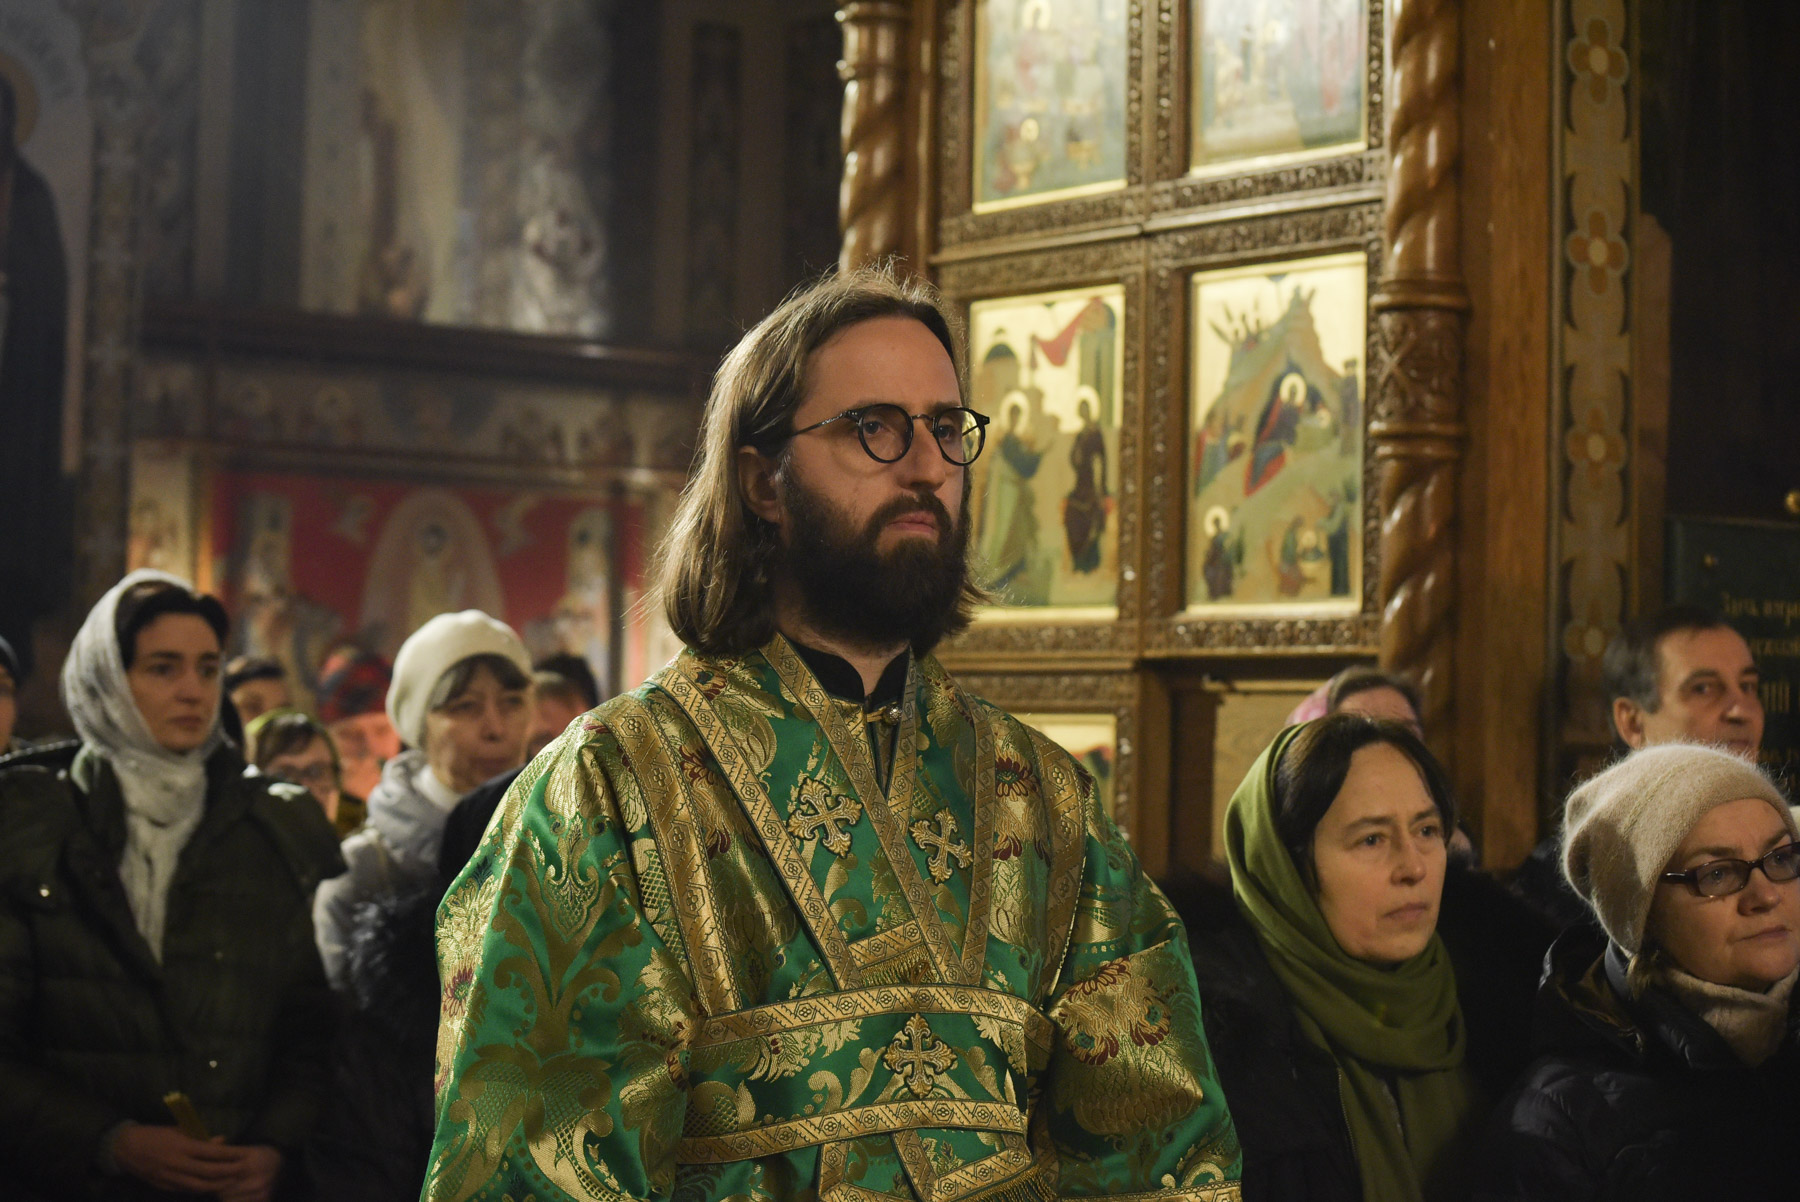 photos of orthodox christmas 0041 2